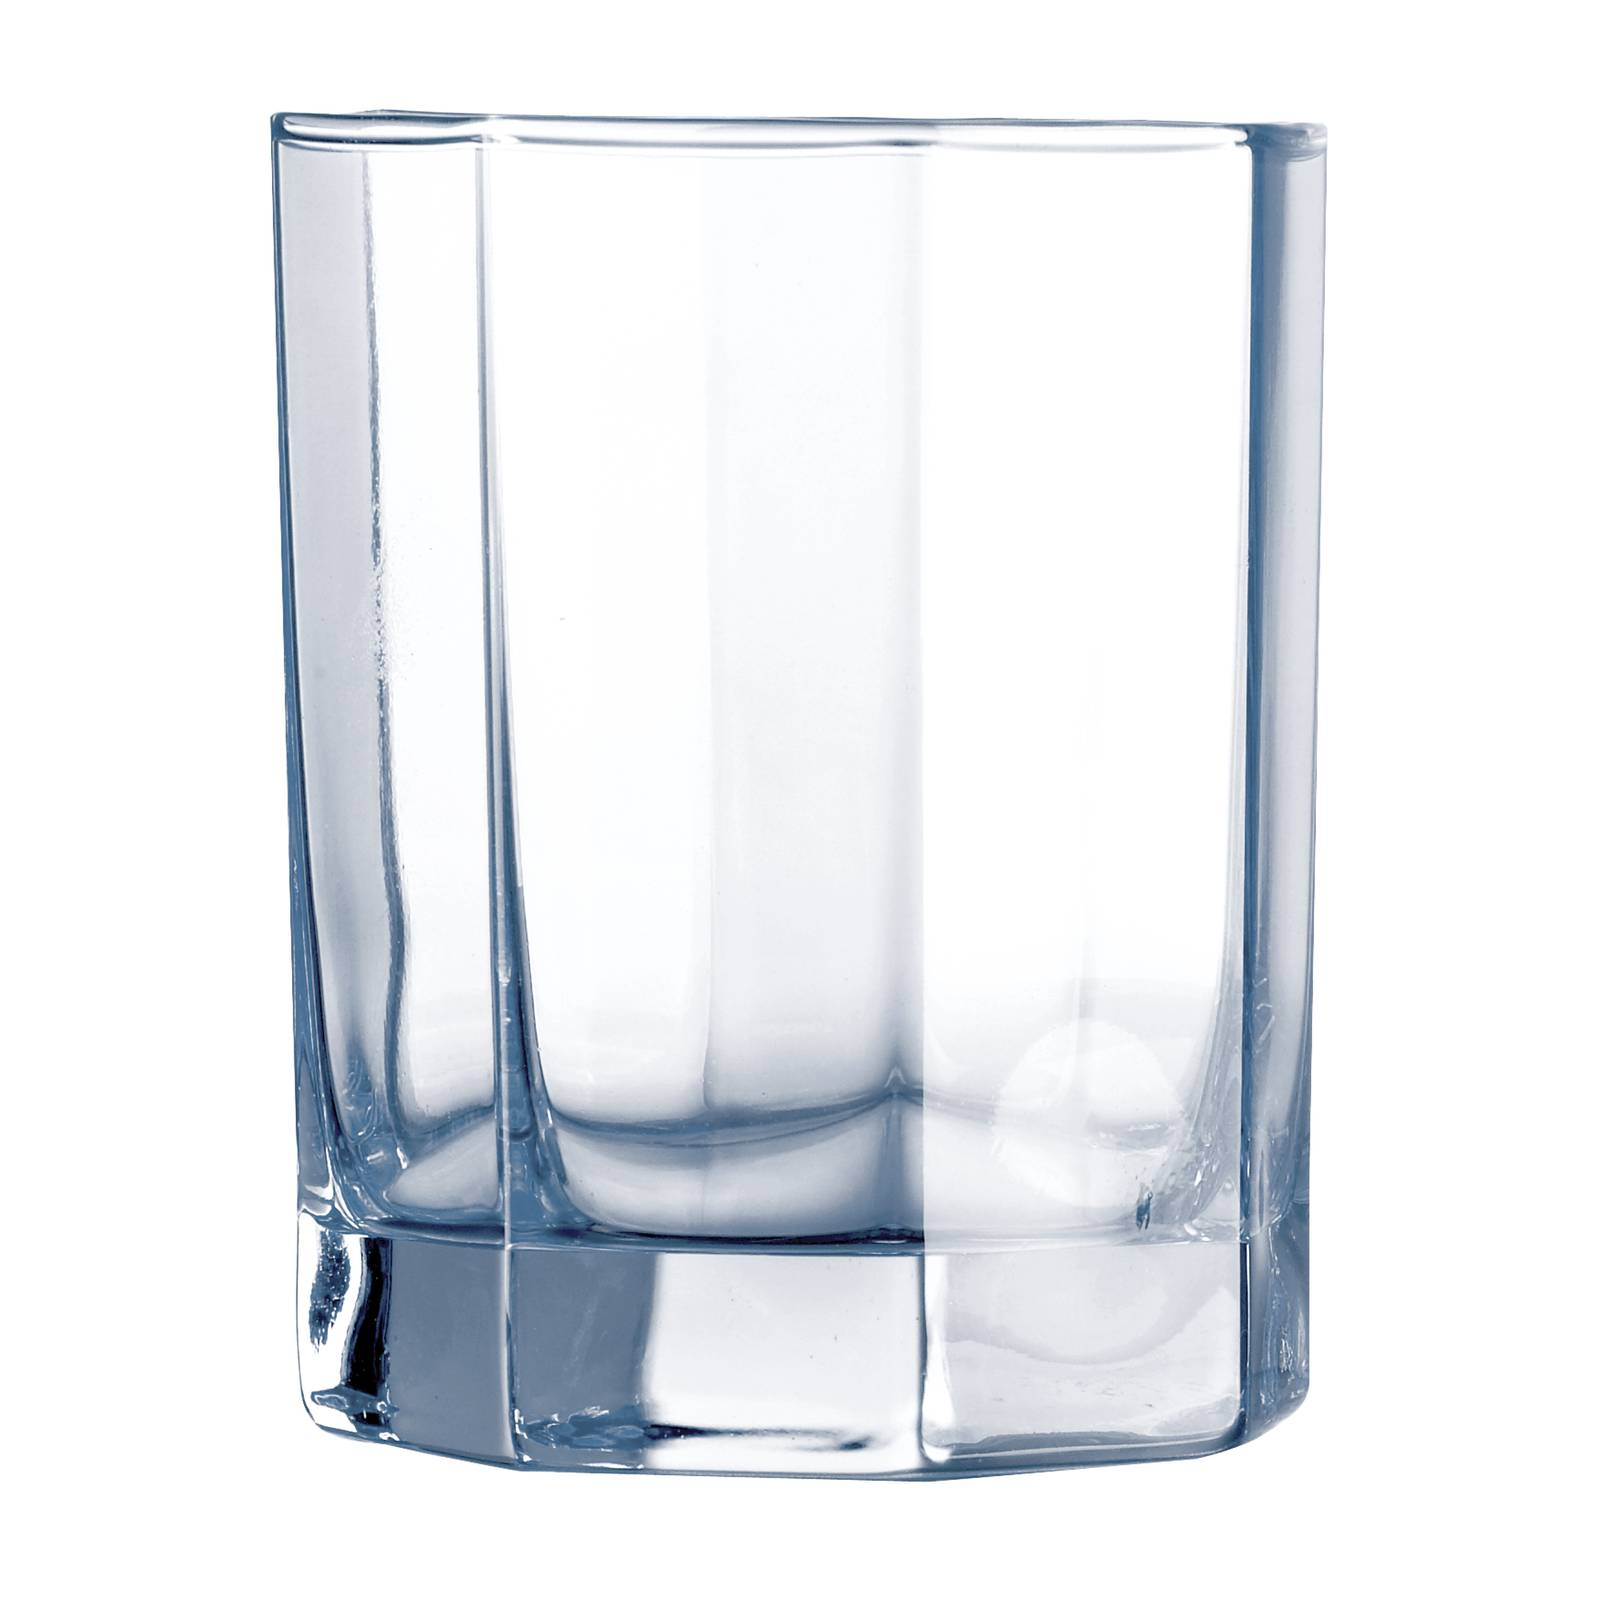 Set of 6 glasses Octime 300 ml LUMINARC